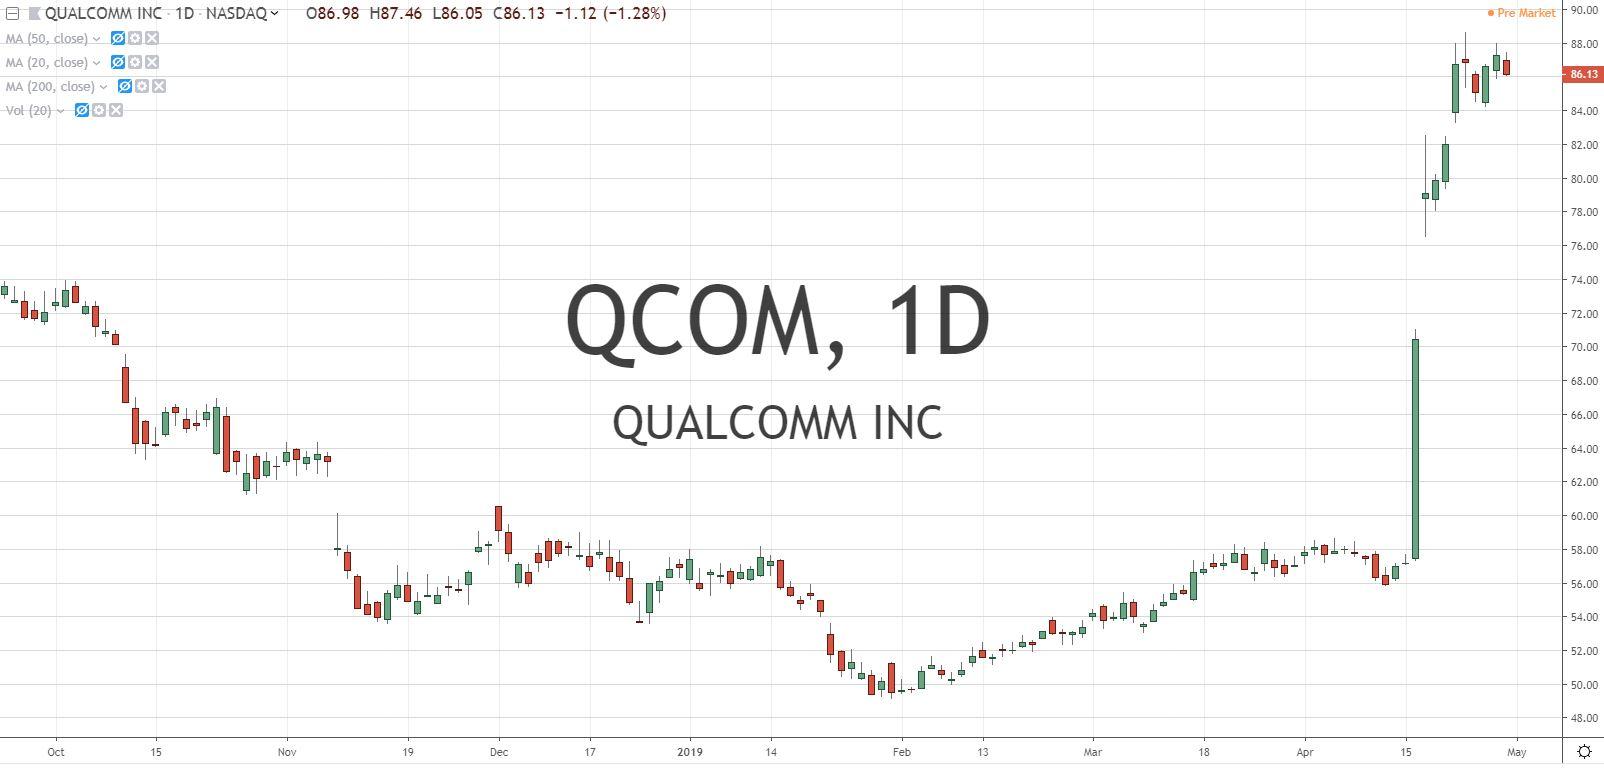 Qualcomm Inc QCOM Stock Chart 5.1.19 Before Earnings